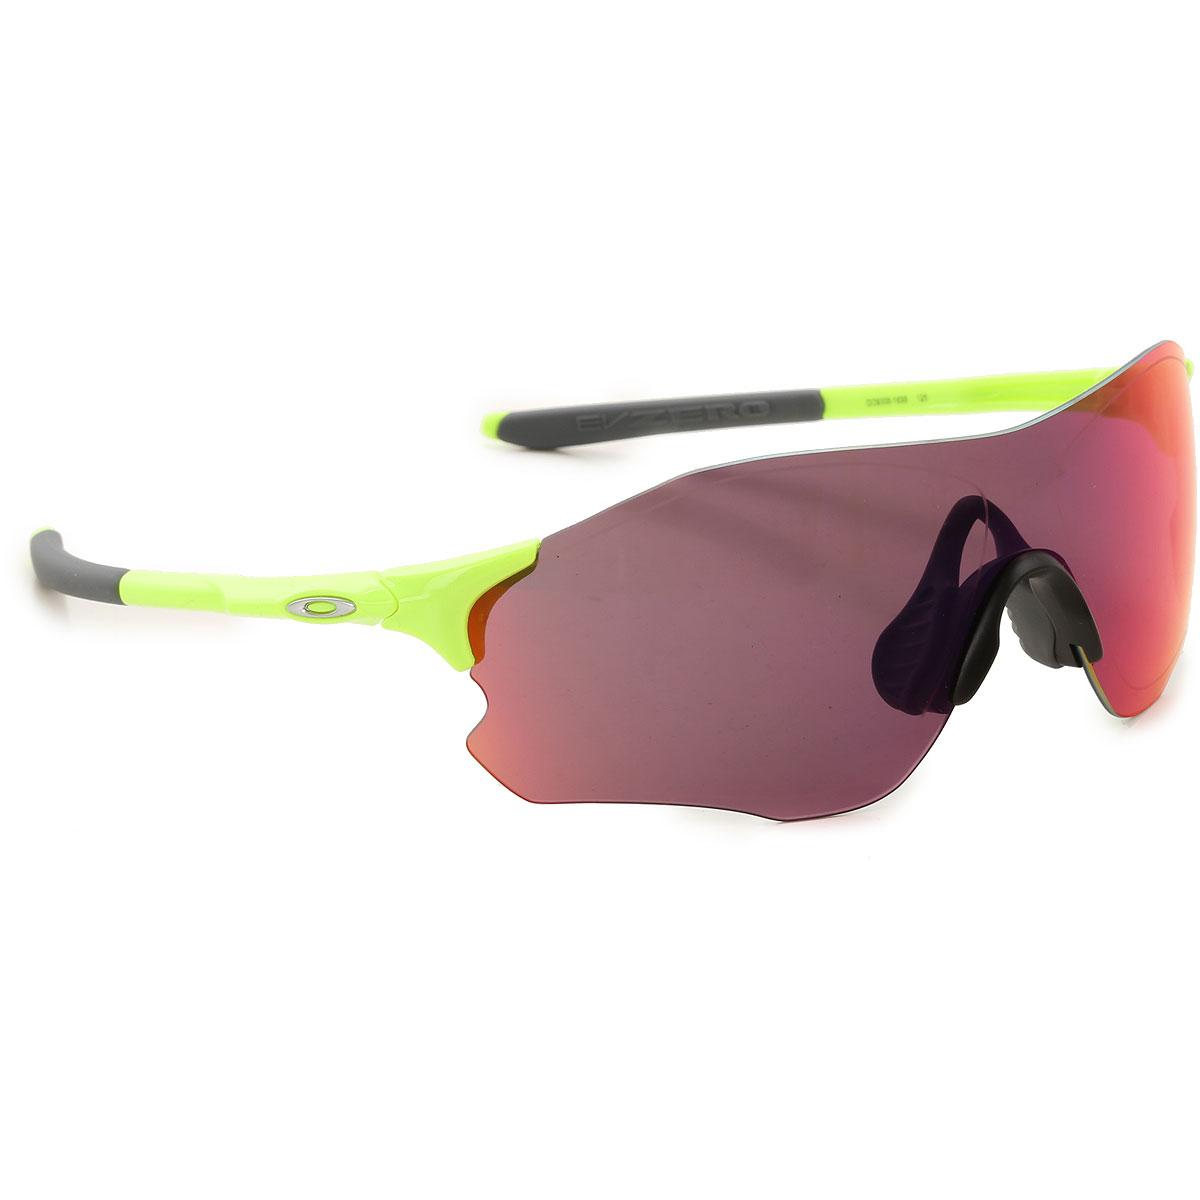 Oakley Sunglasses On Sale, fluo yellow, 2019